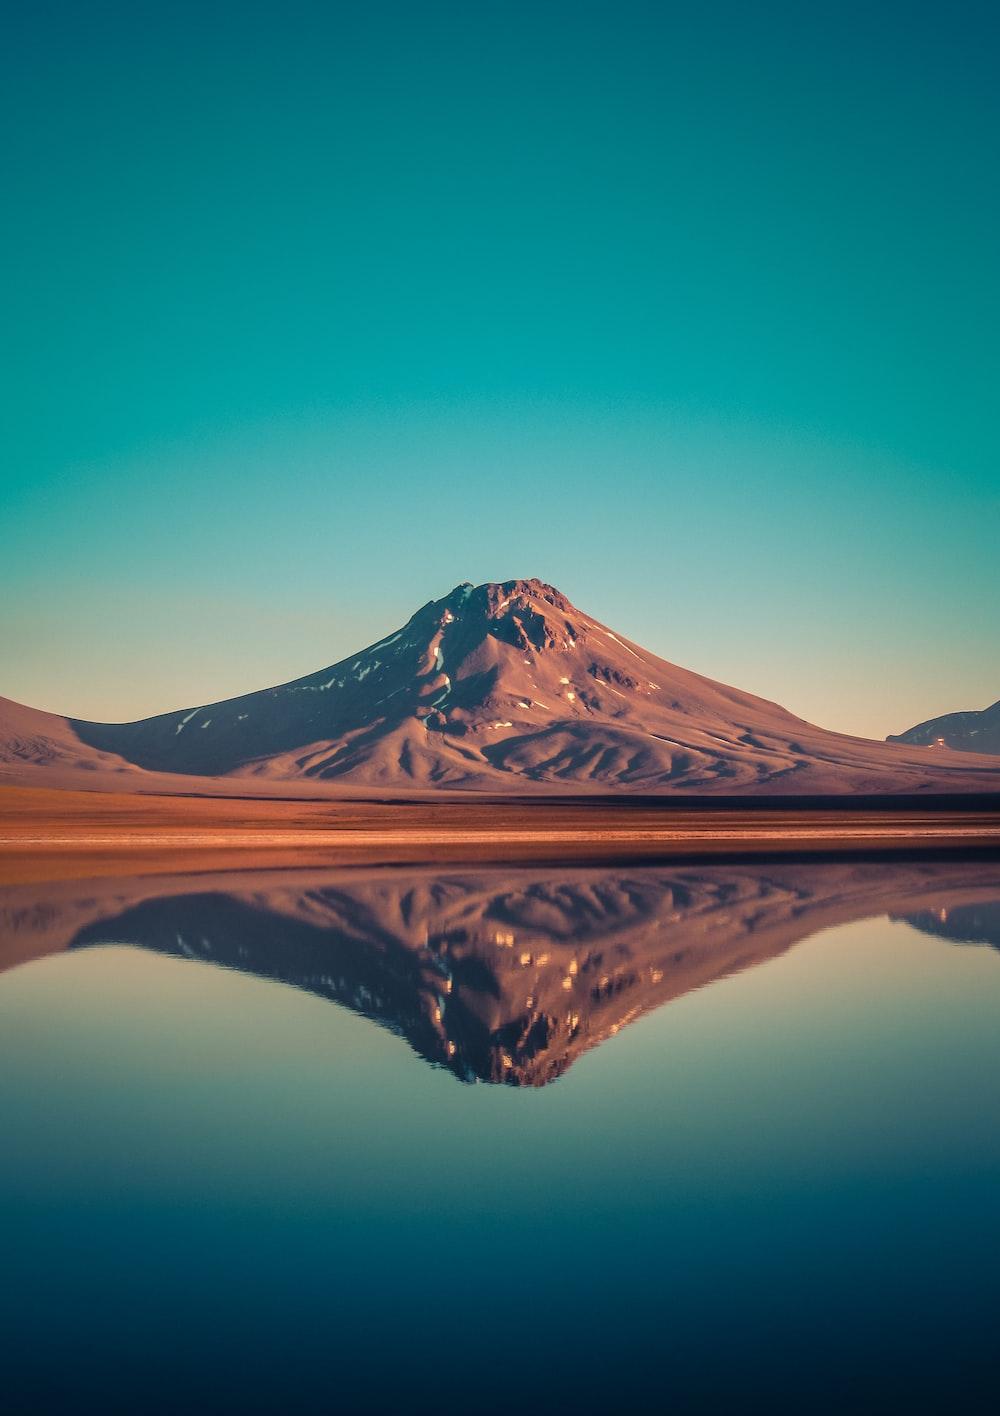 mountain near body of water view